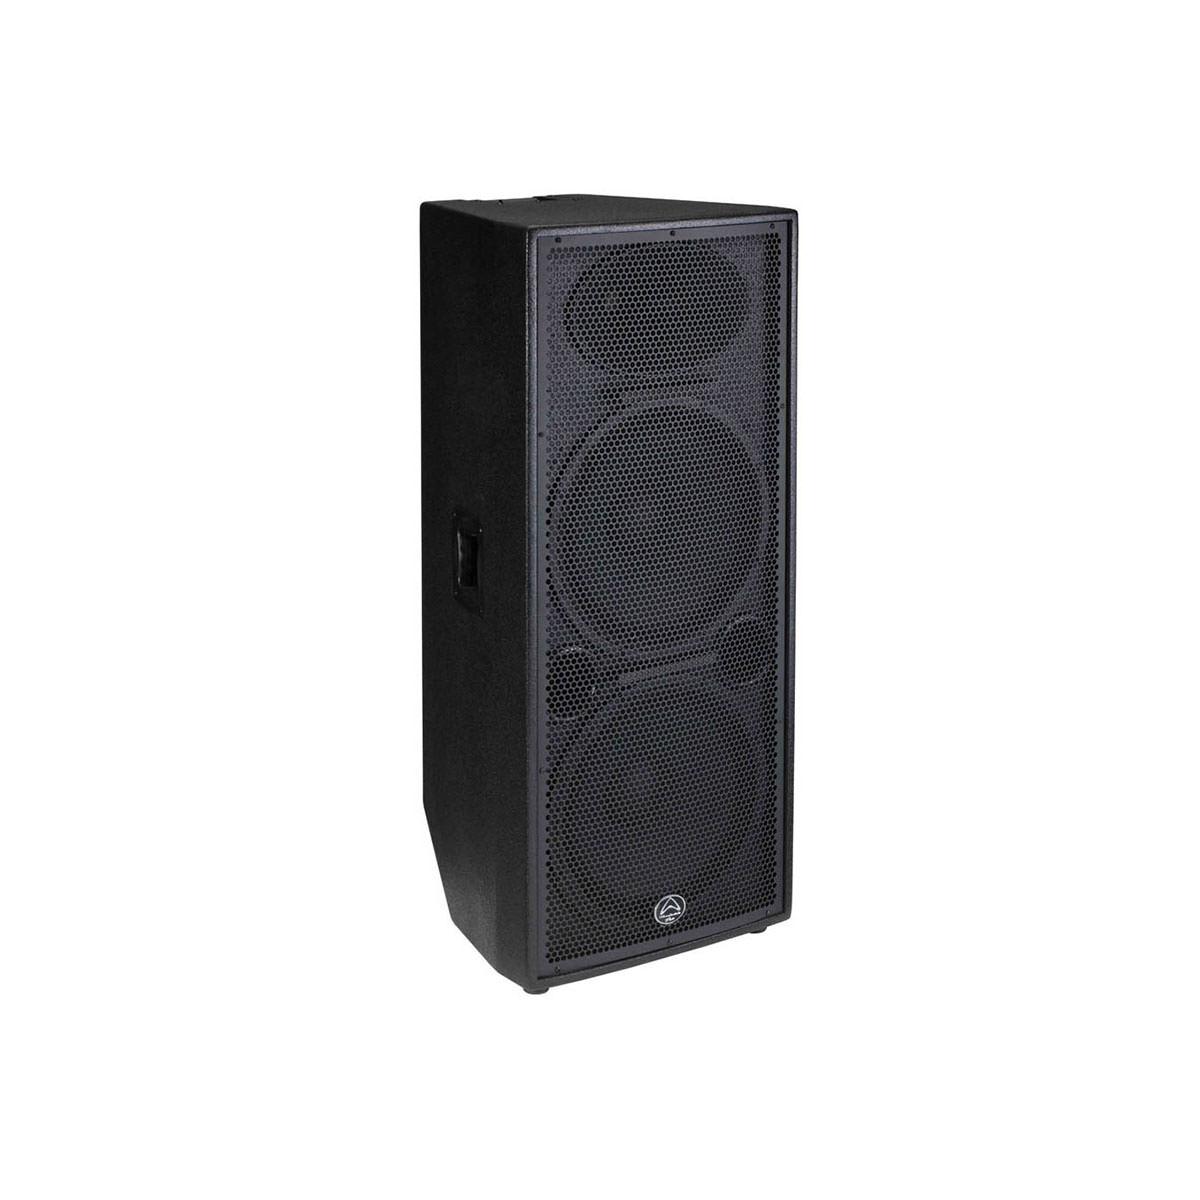 Wharfedale Delta 215 Dual Speaker